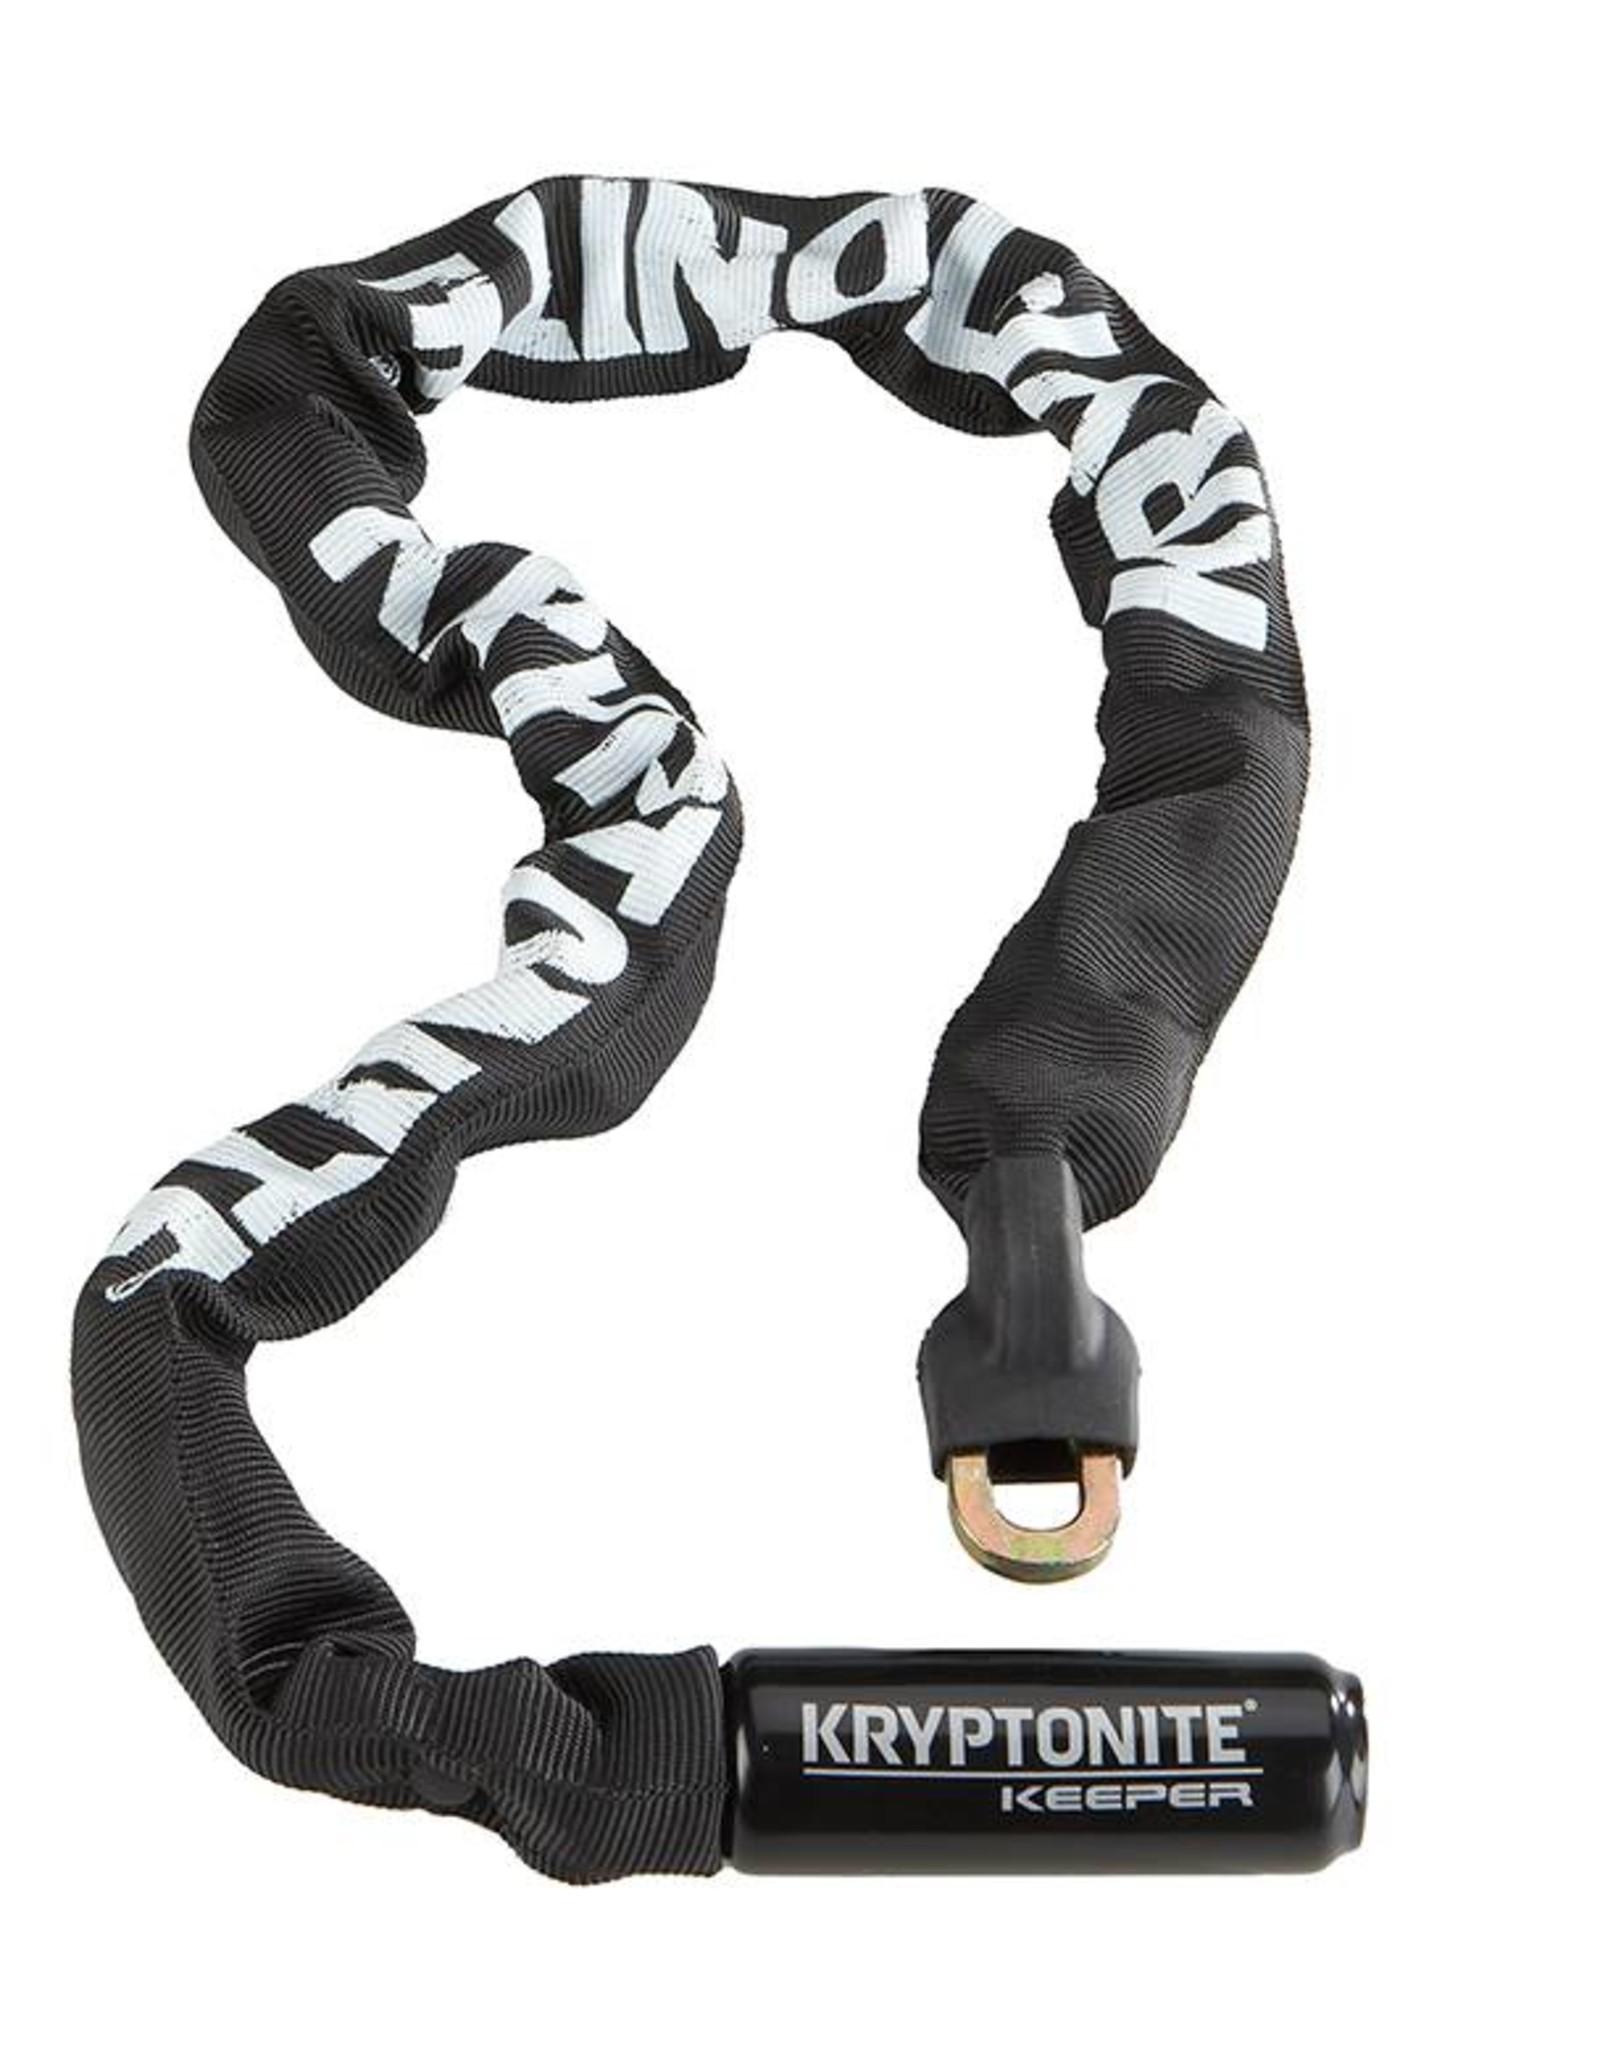 Kryptonite Keeper 785 Integrated Chain Lock - Black